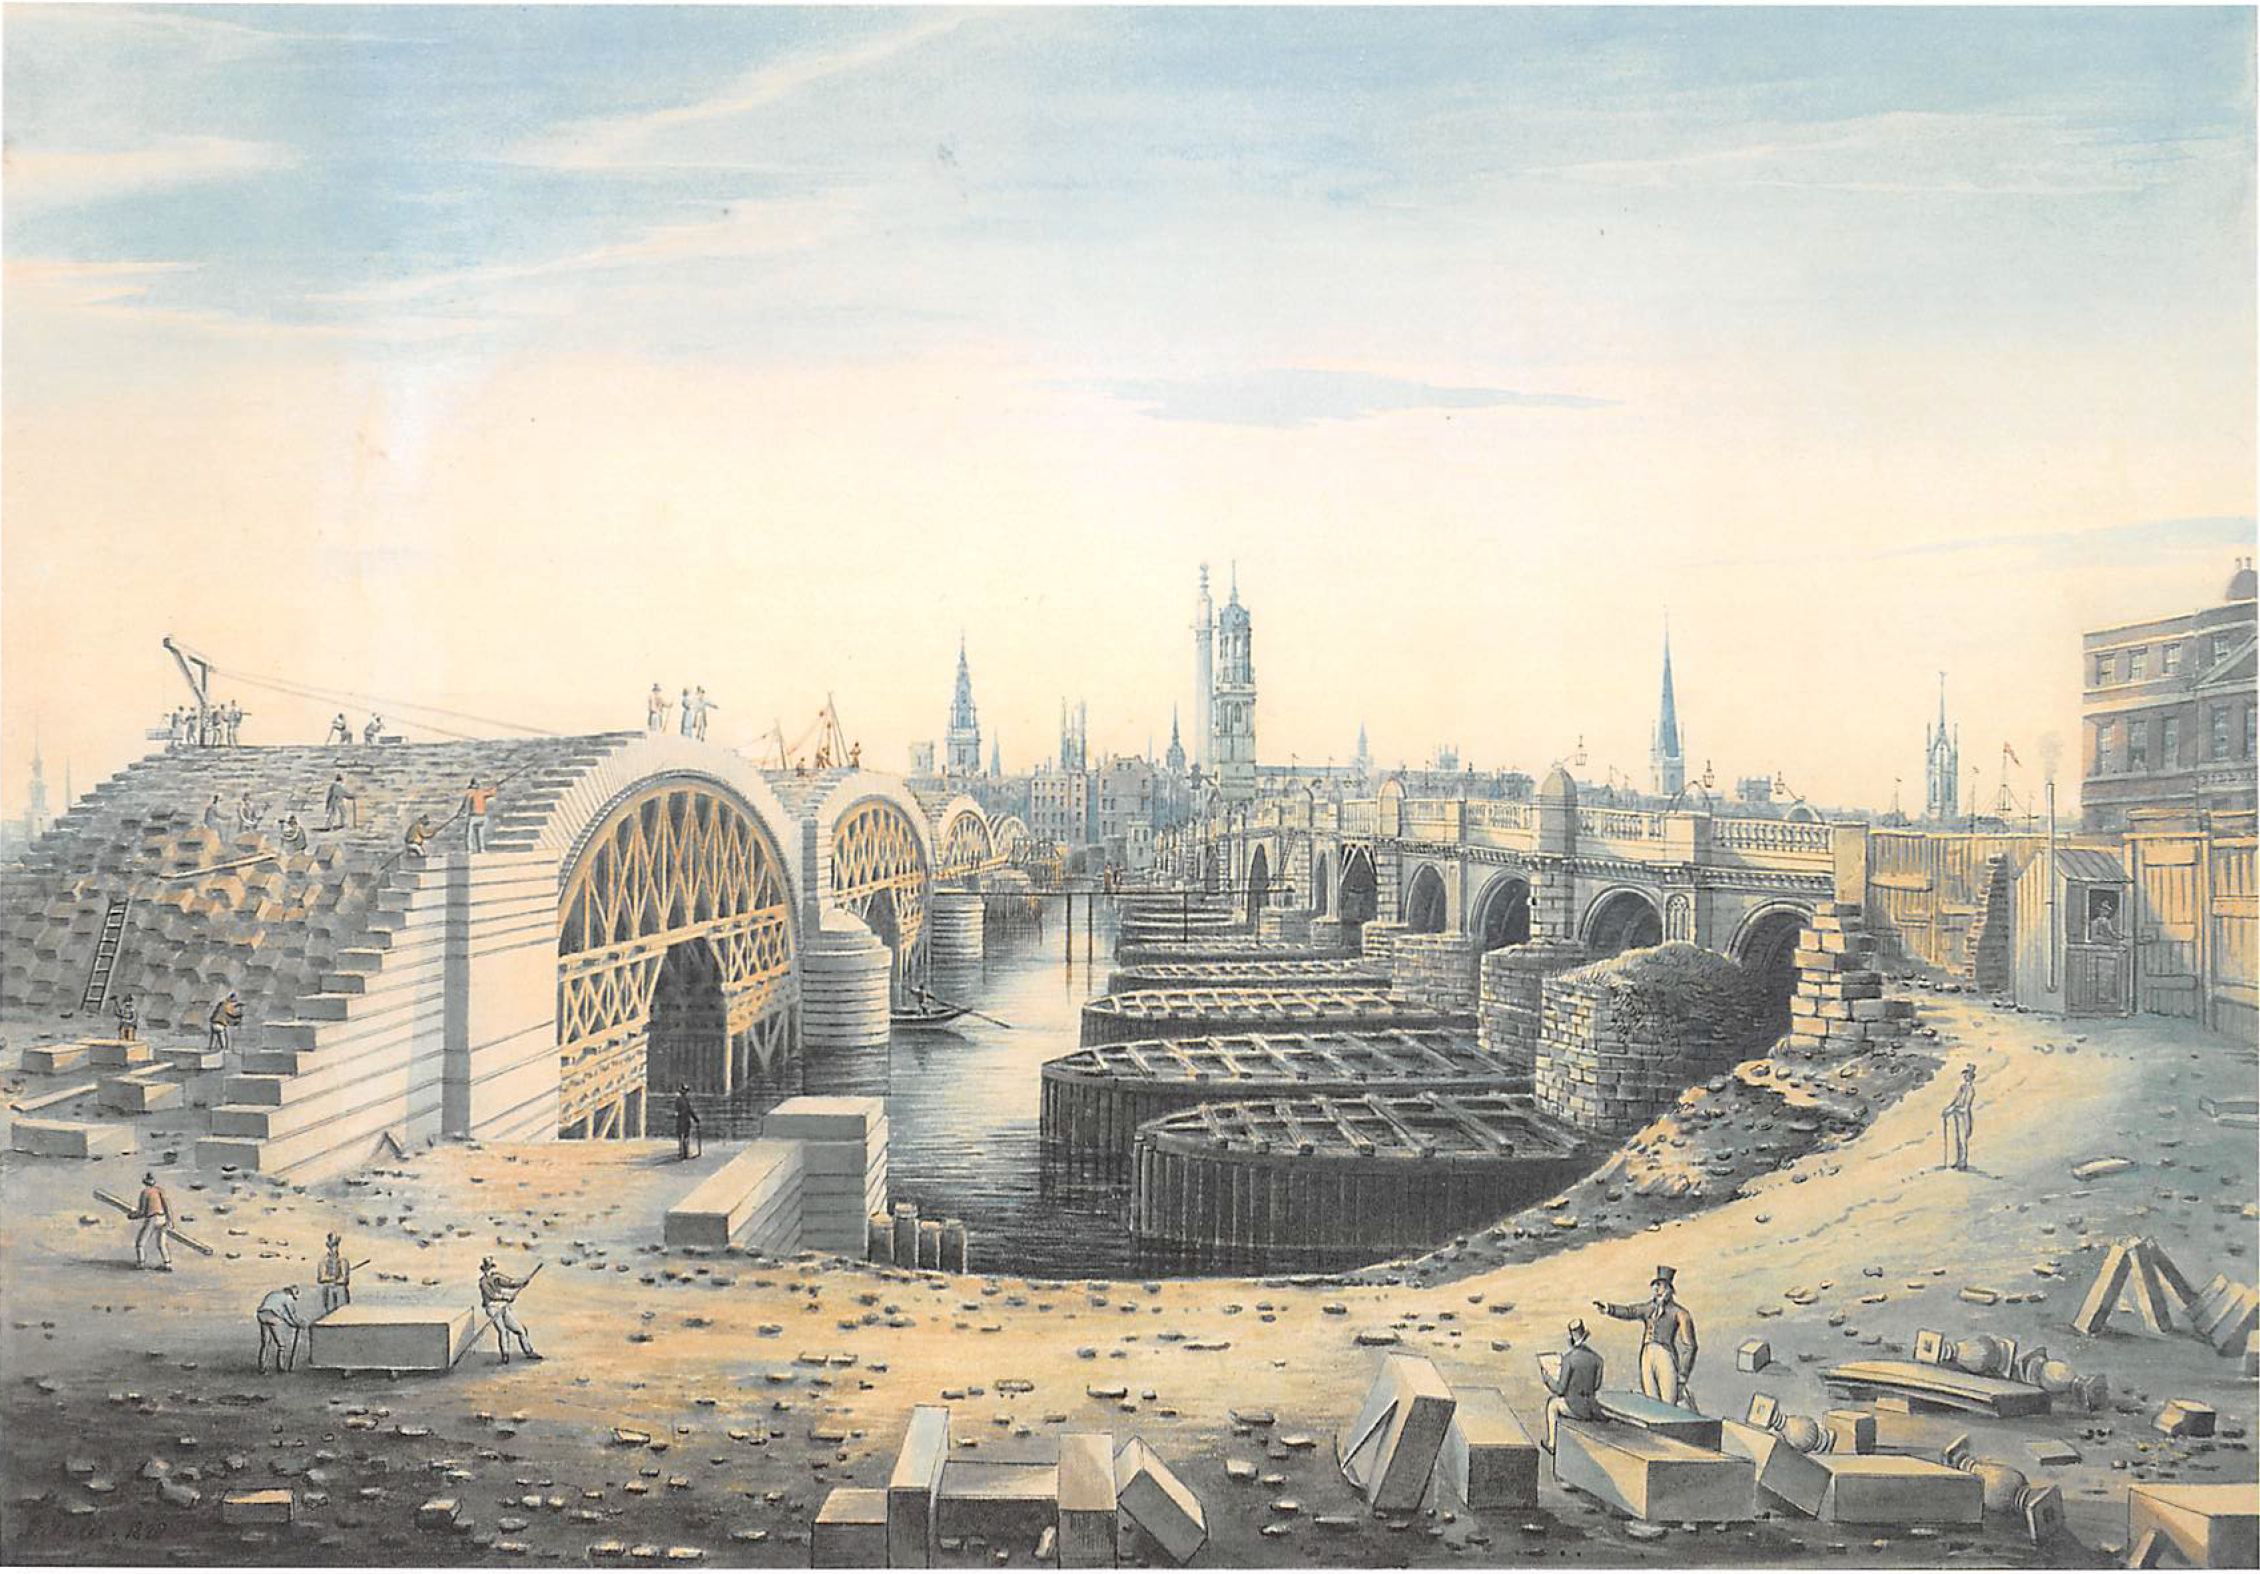 The_Construction_of_New_London_Bridge_alongside_the_old_bridge_by_Gideon_Yates,_1828.png